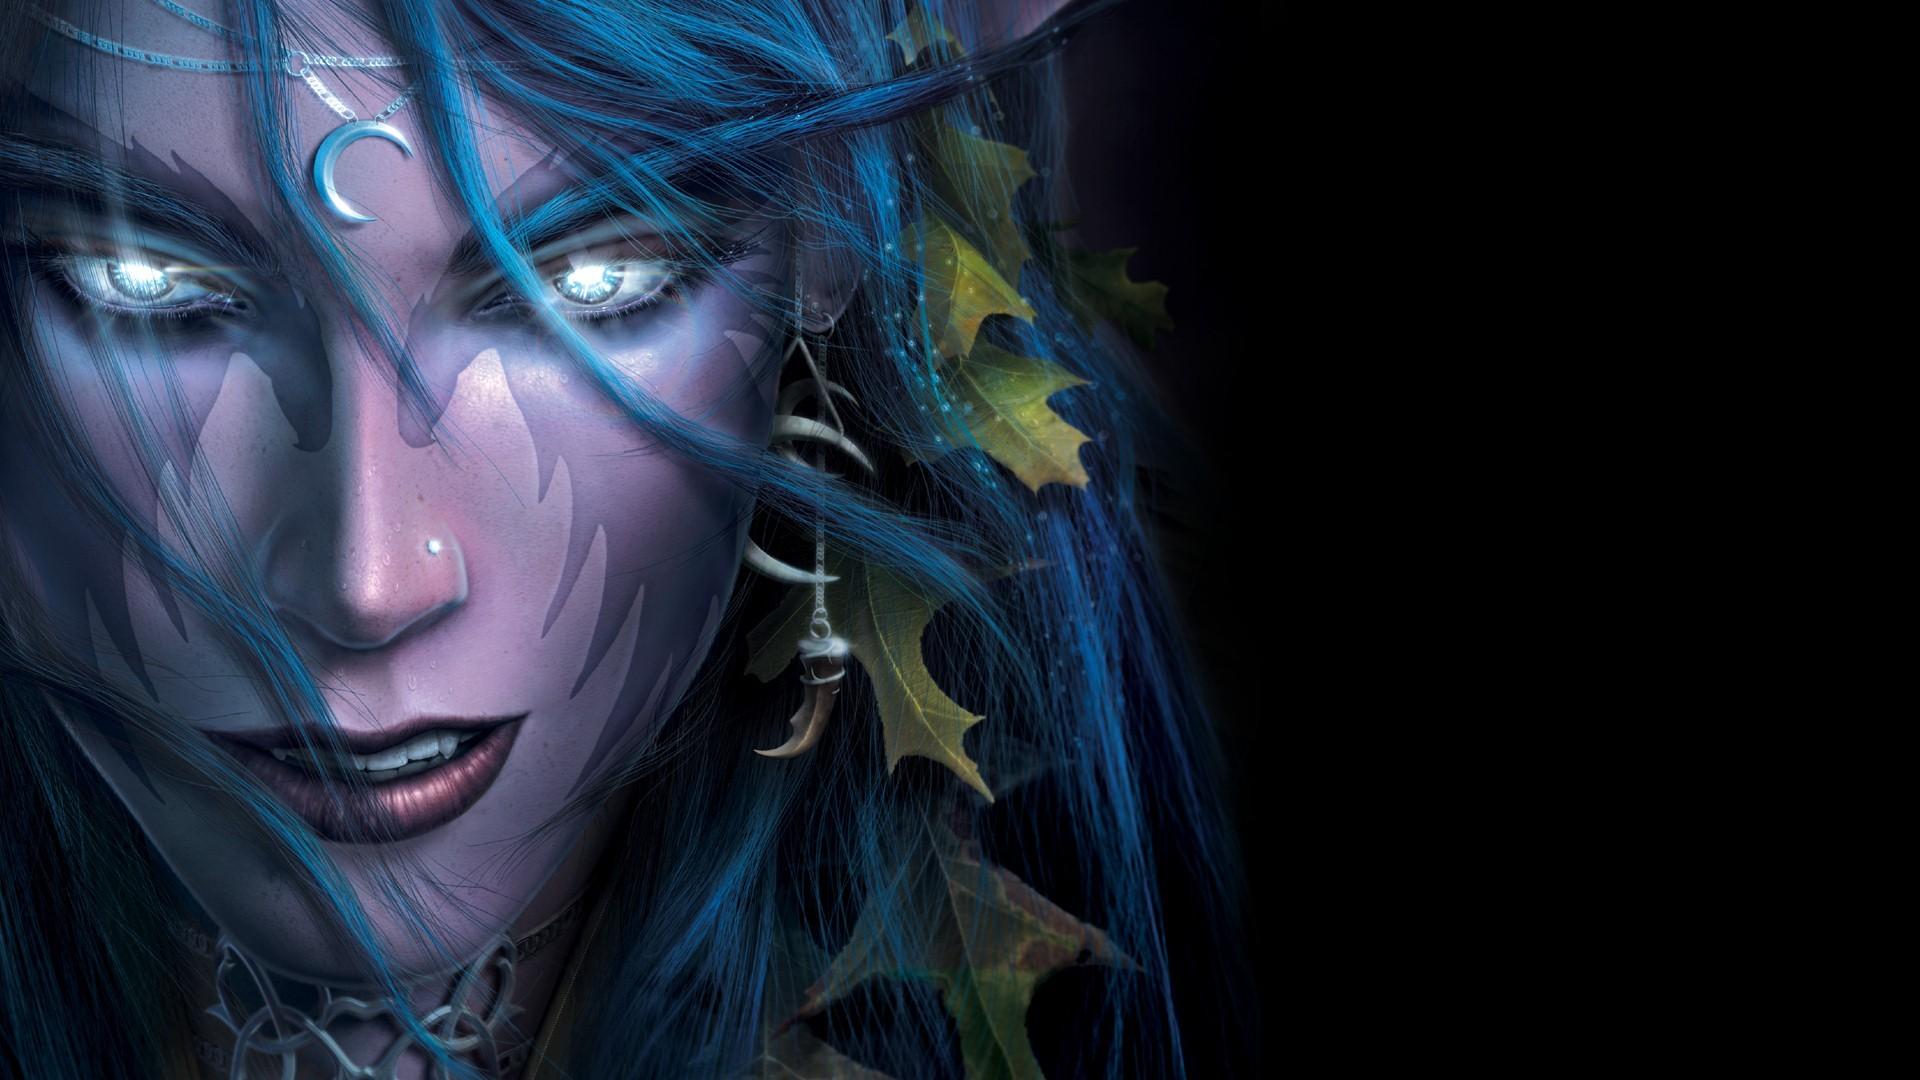 Beautful elves warcraft adult images